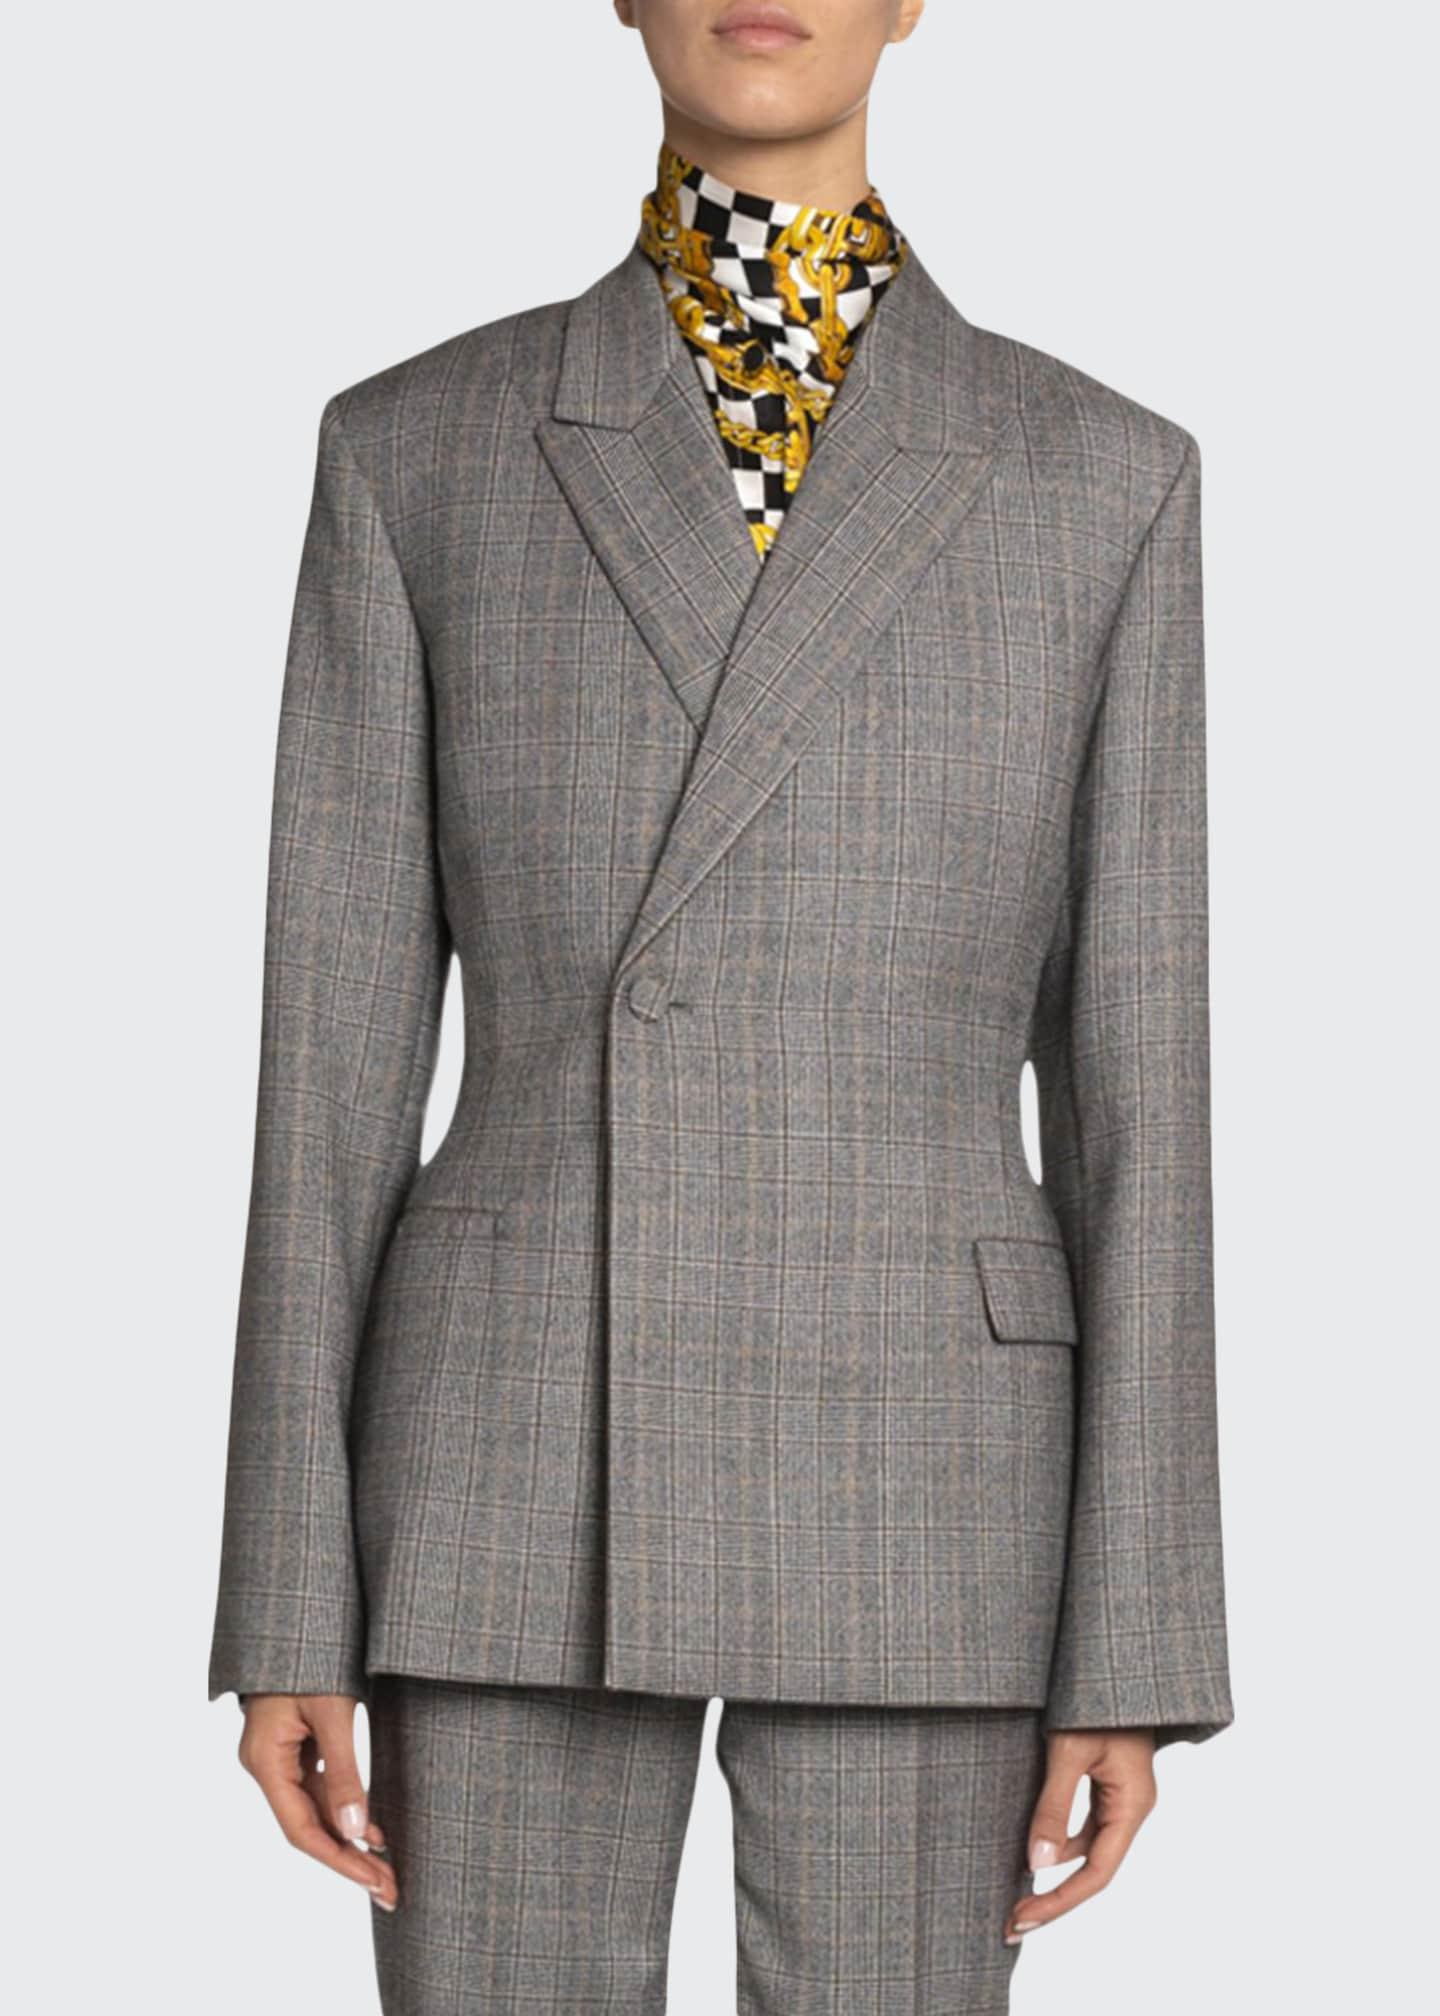 Balenciaga Checked Wool Blazer Jacket